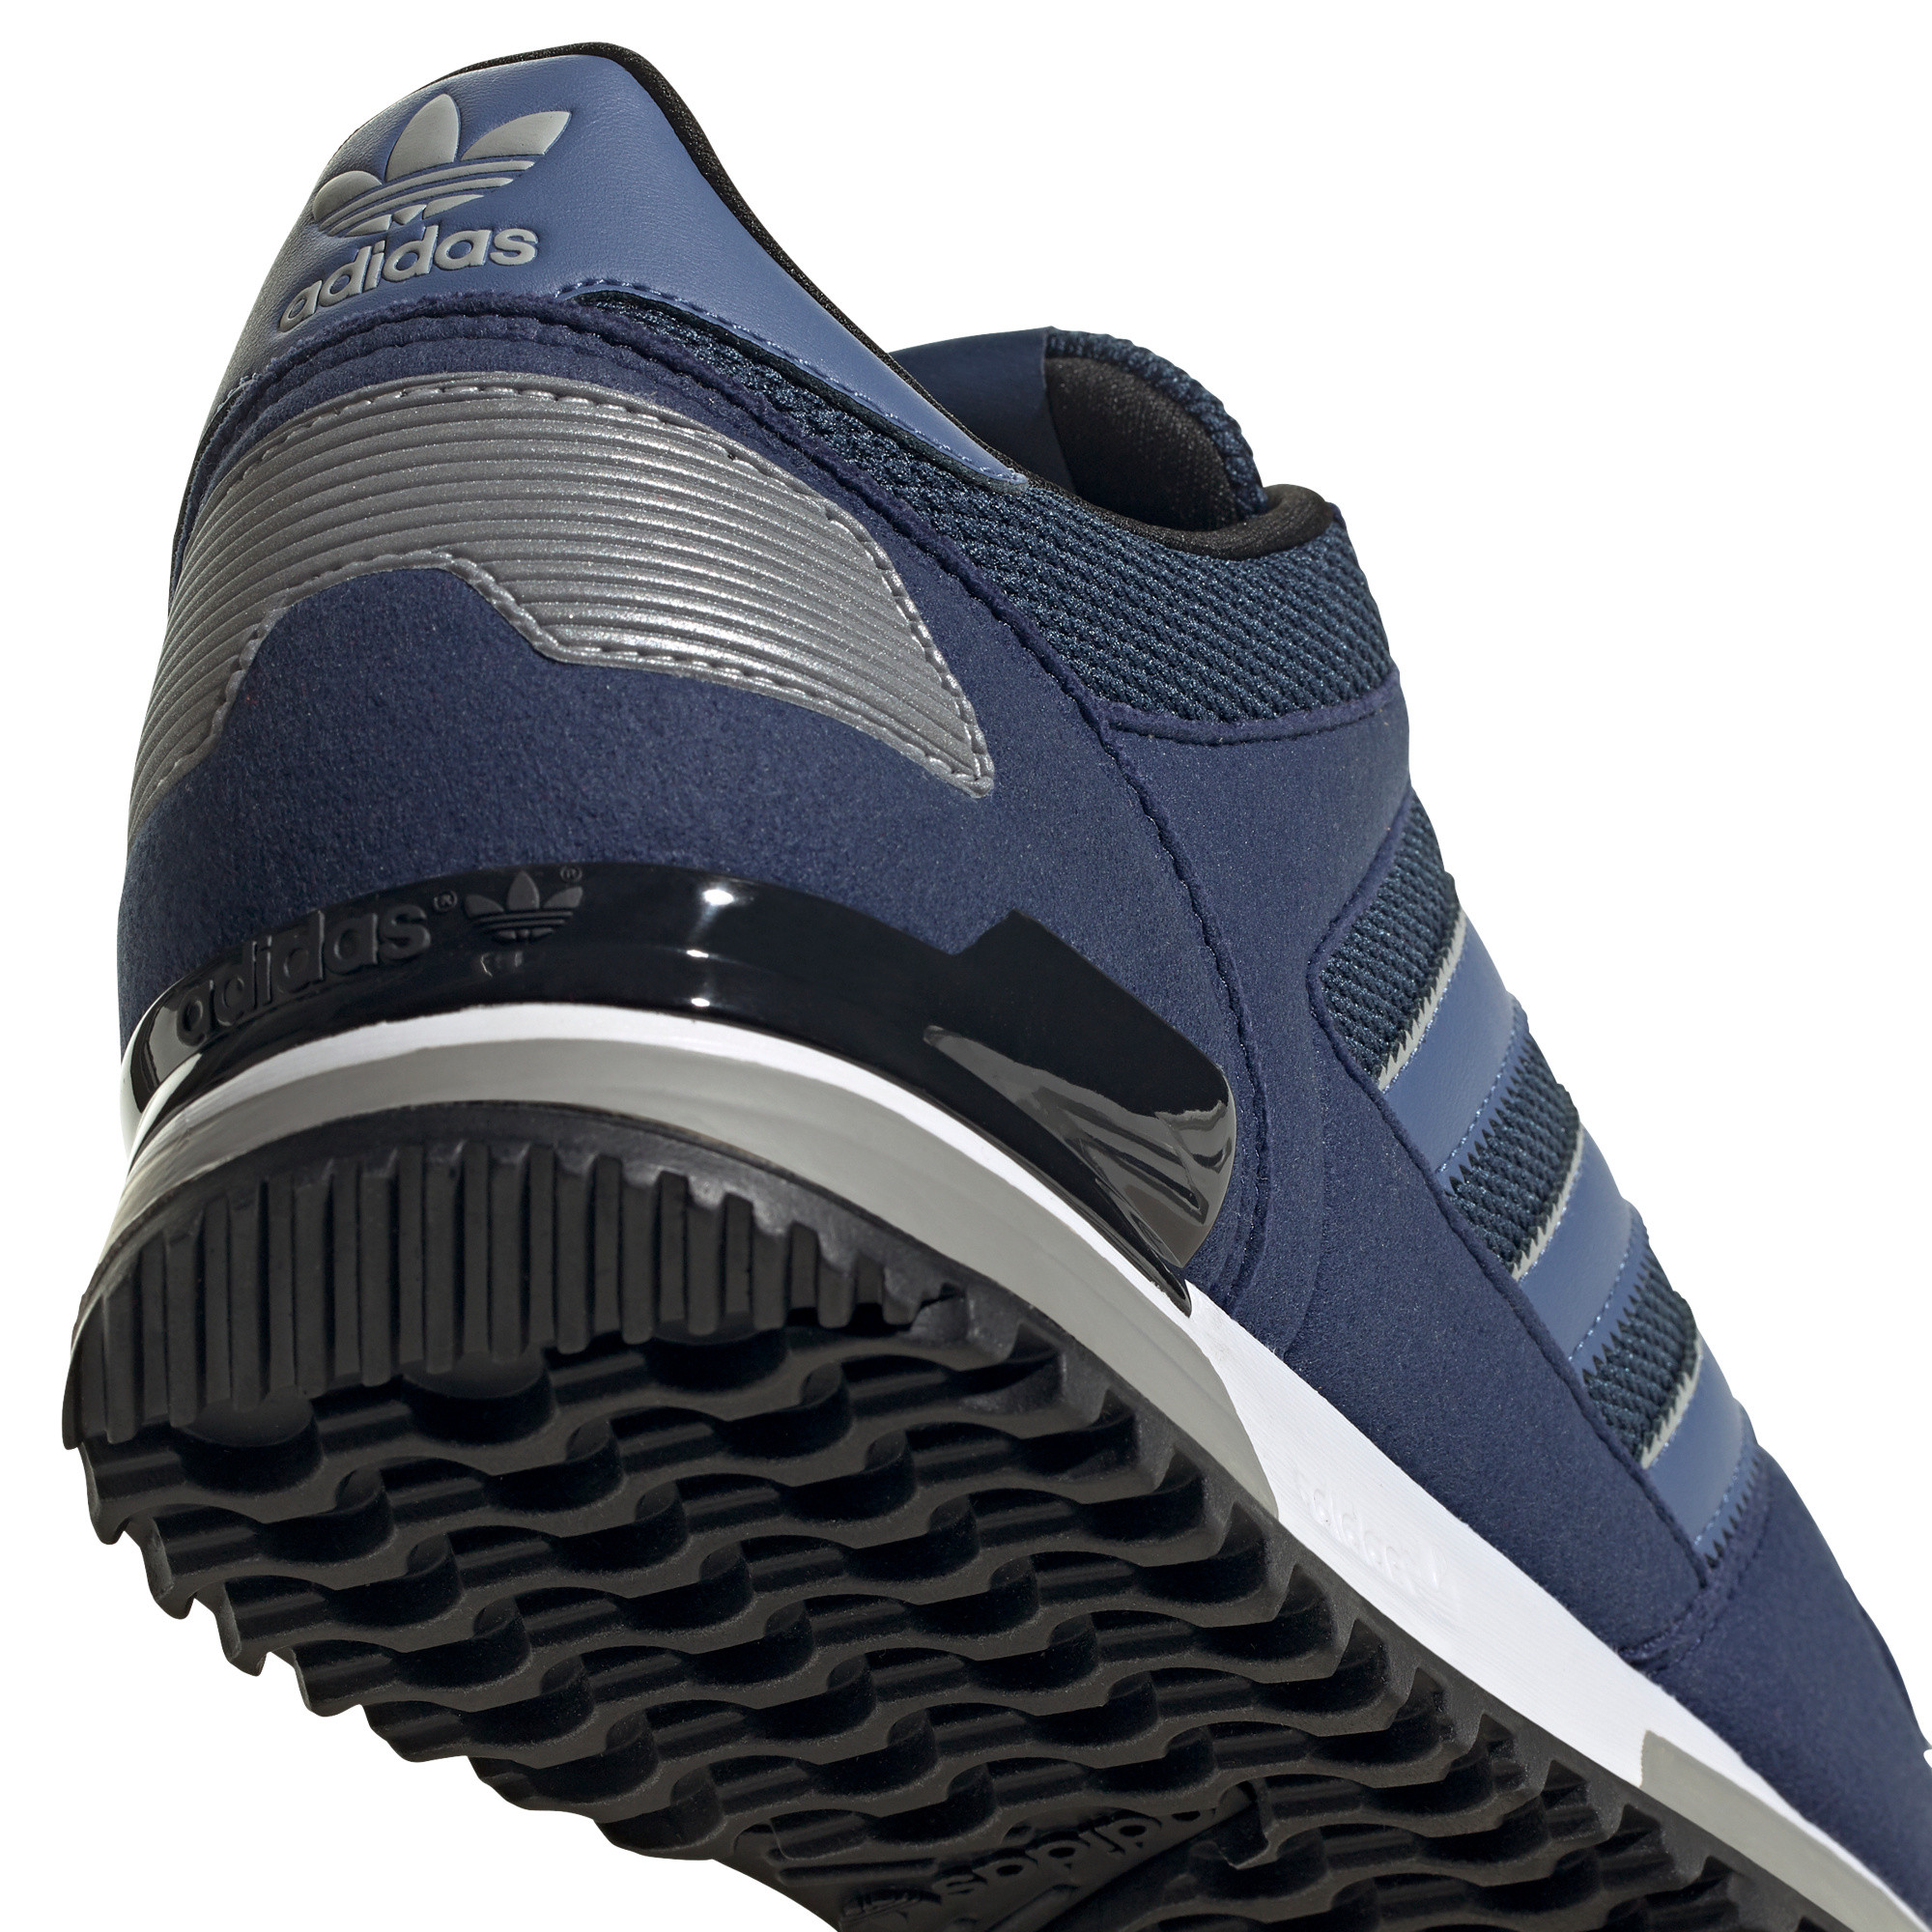 Scarpe uomo ZX 700, Blu scuro, large image number 6